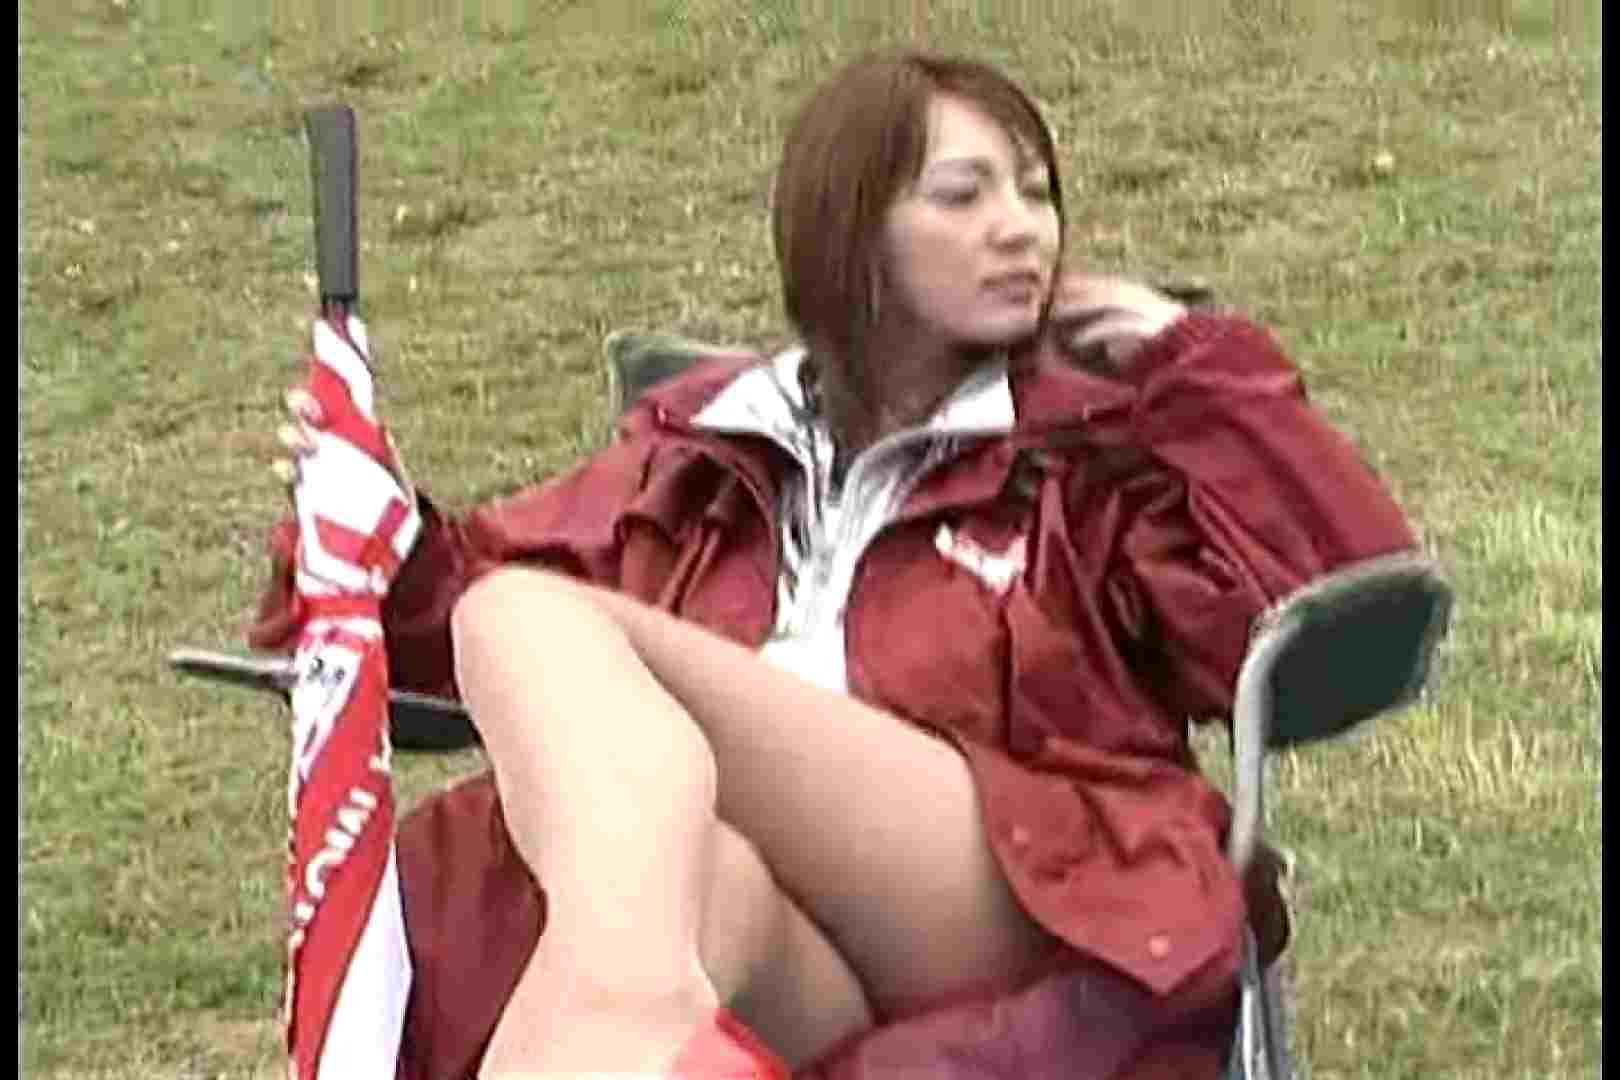 RQカメラ地獄Vol.4 マンコ スケベ動画紹介 104pic 73